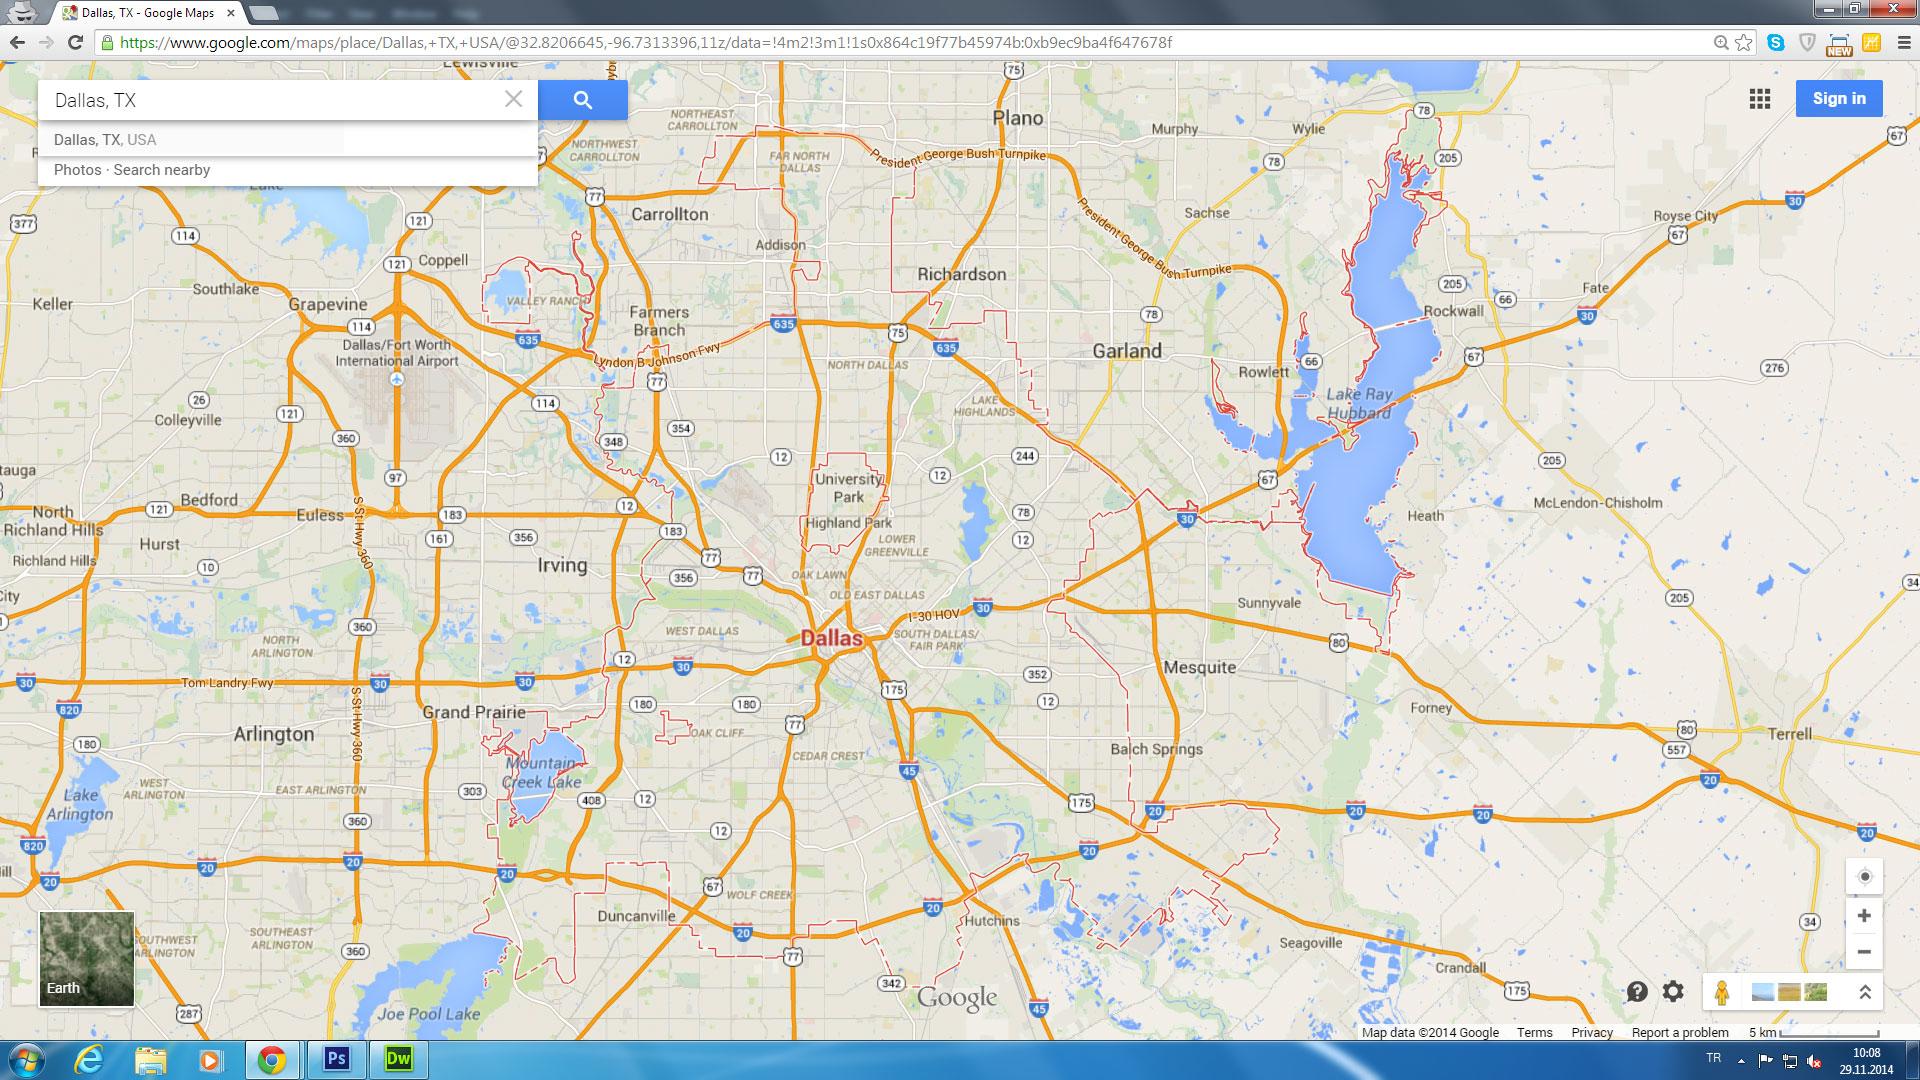 Dallas Texas Google Maps #225280 - Google Maps Dallas Texas